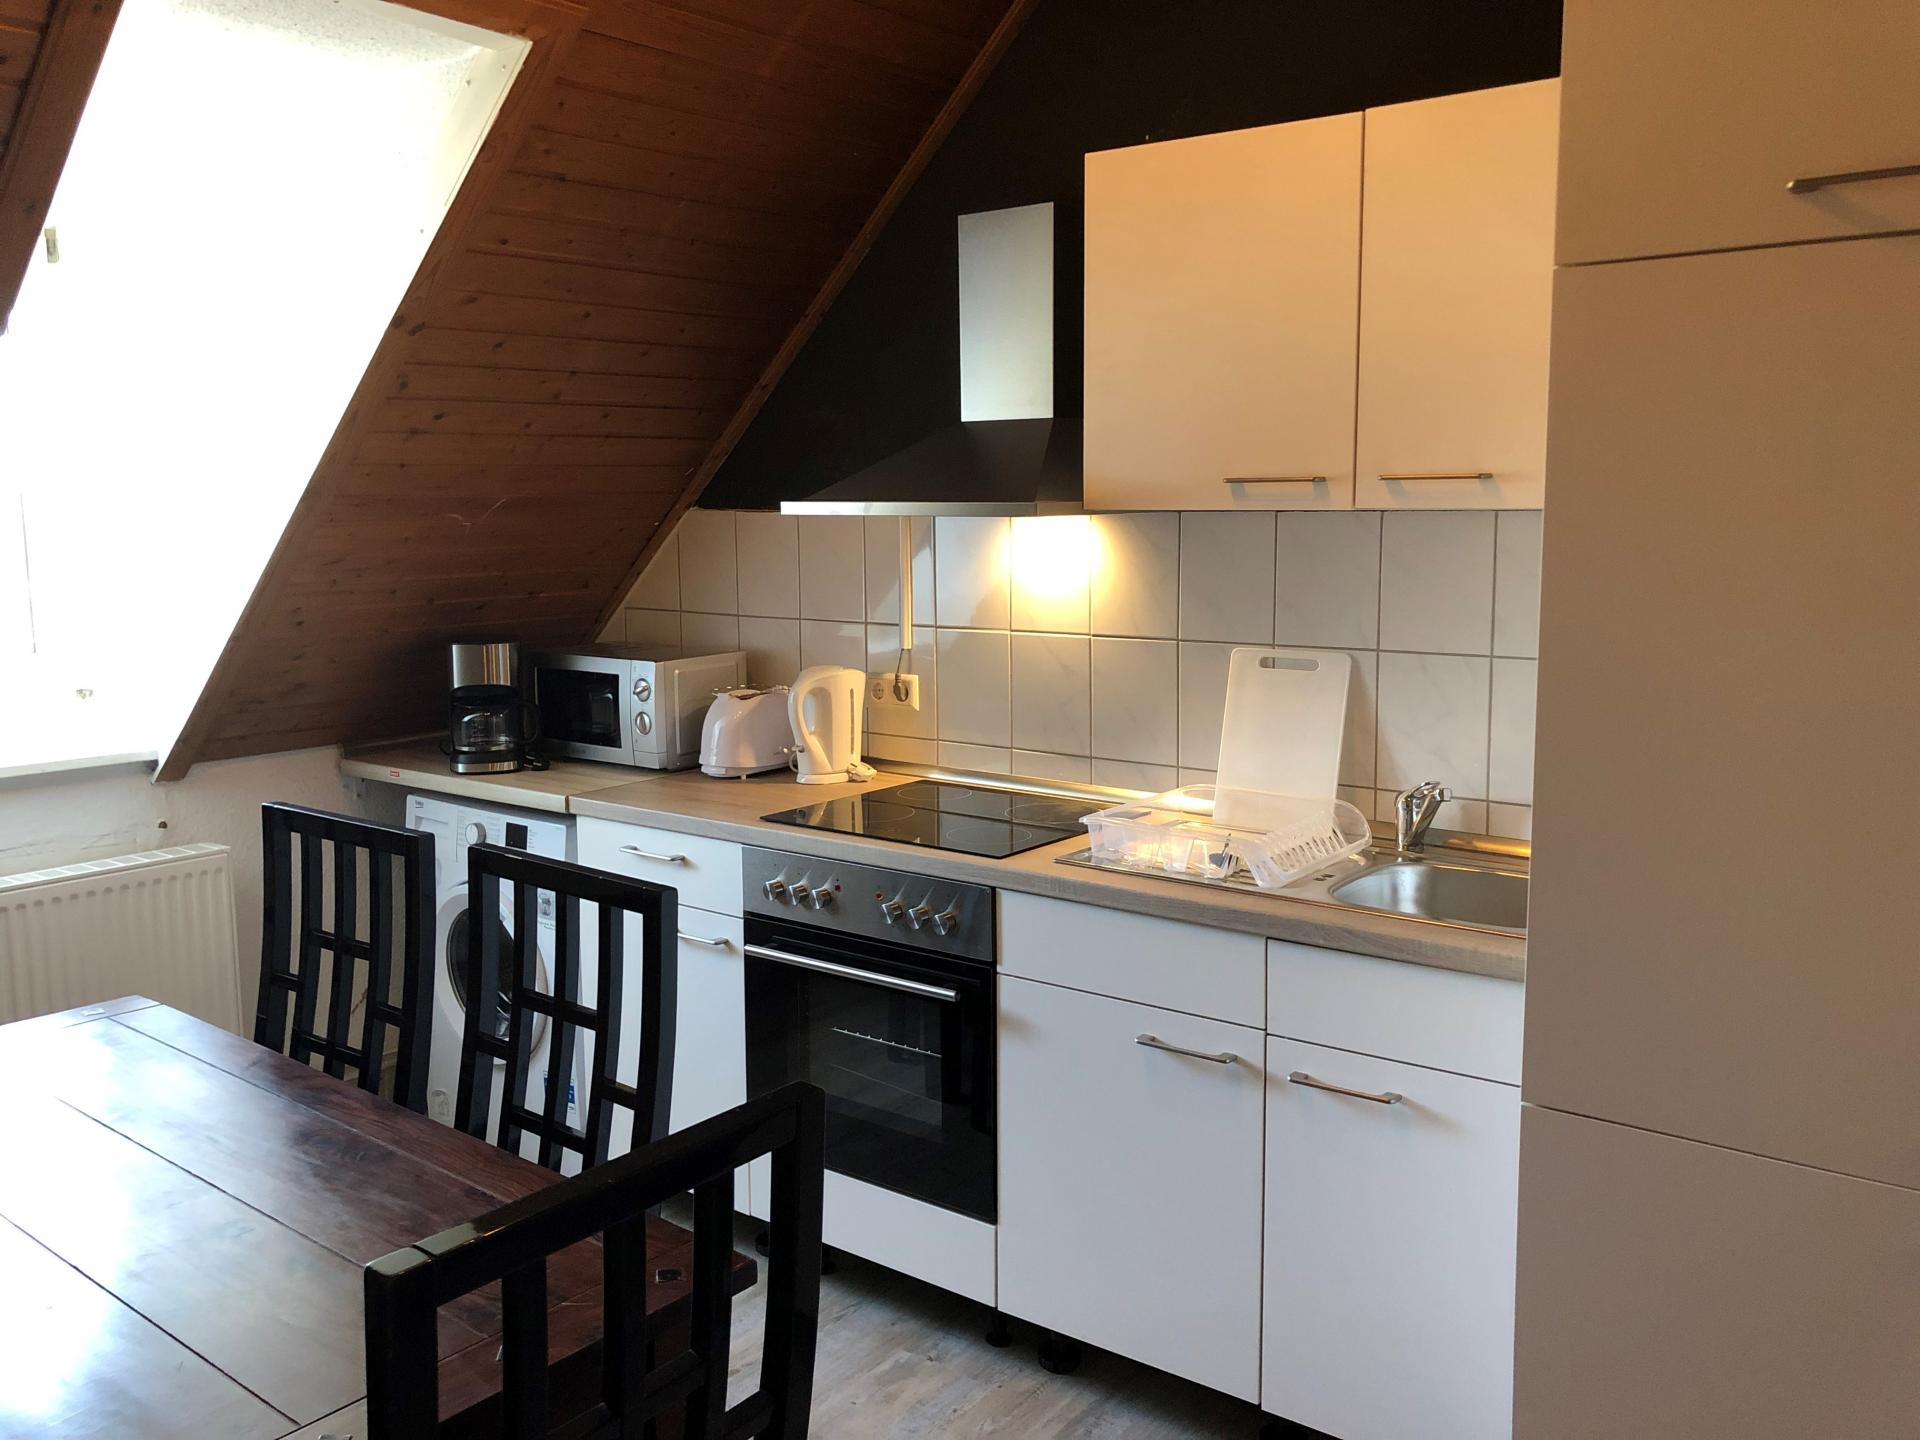 Kitchen at Schulenburger St Apartment